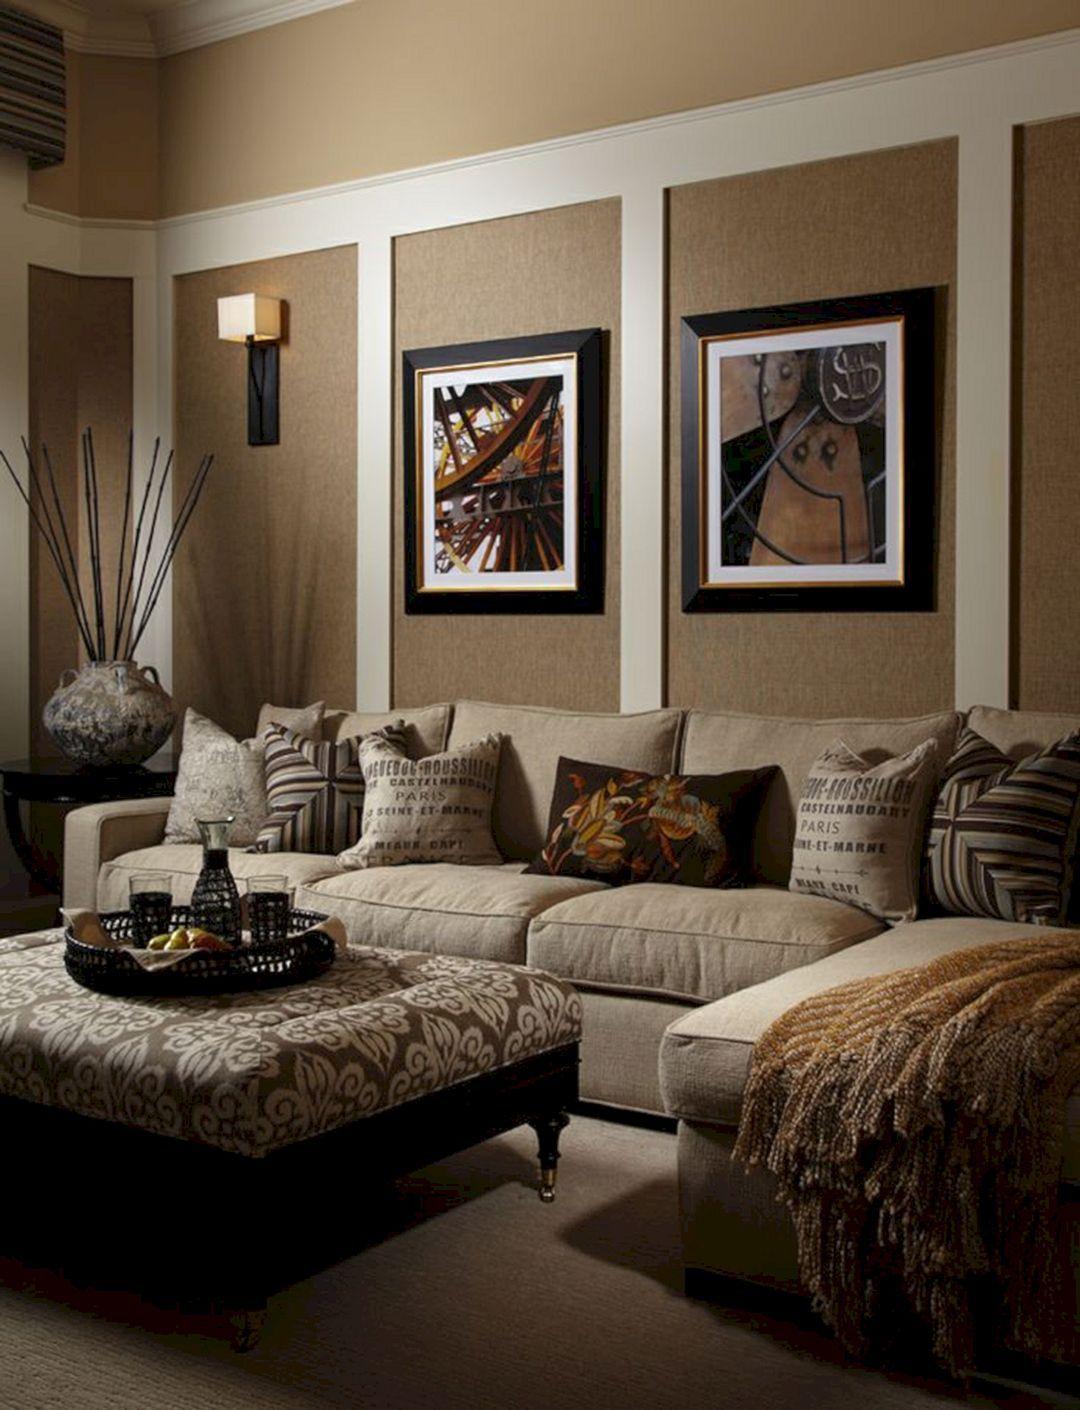 Phenomenal 30 Stunning Living Room Wall Decorating